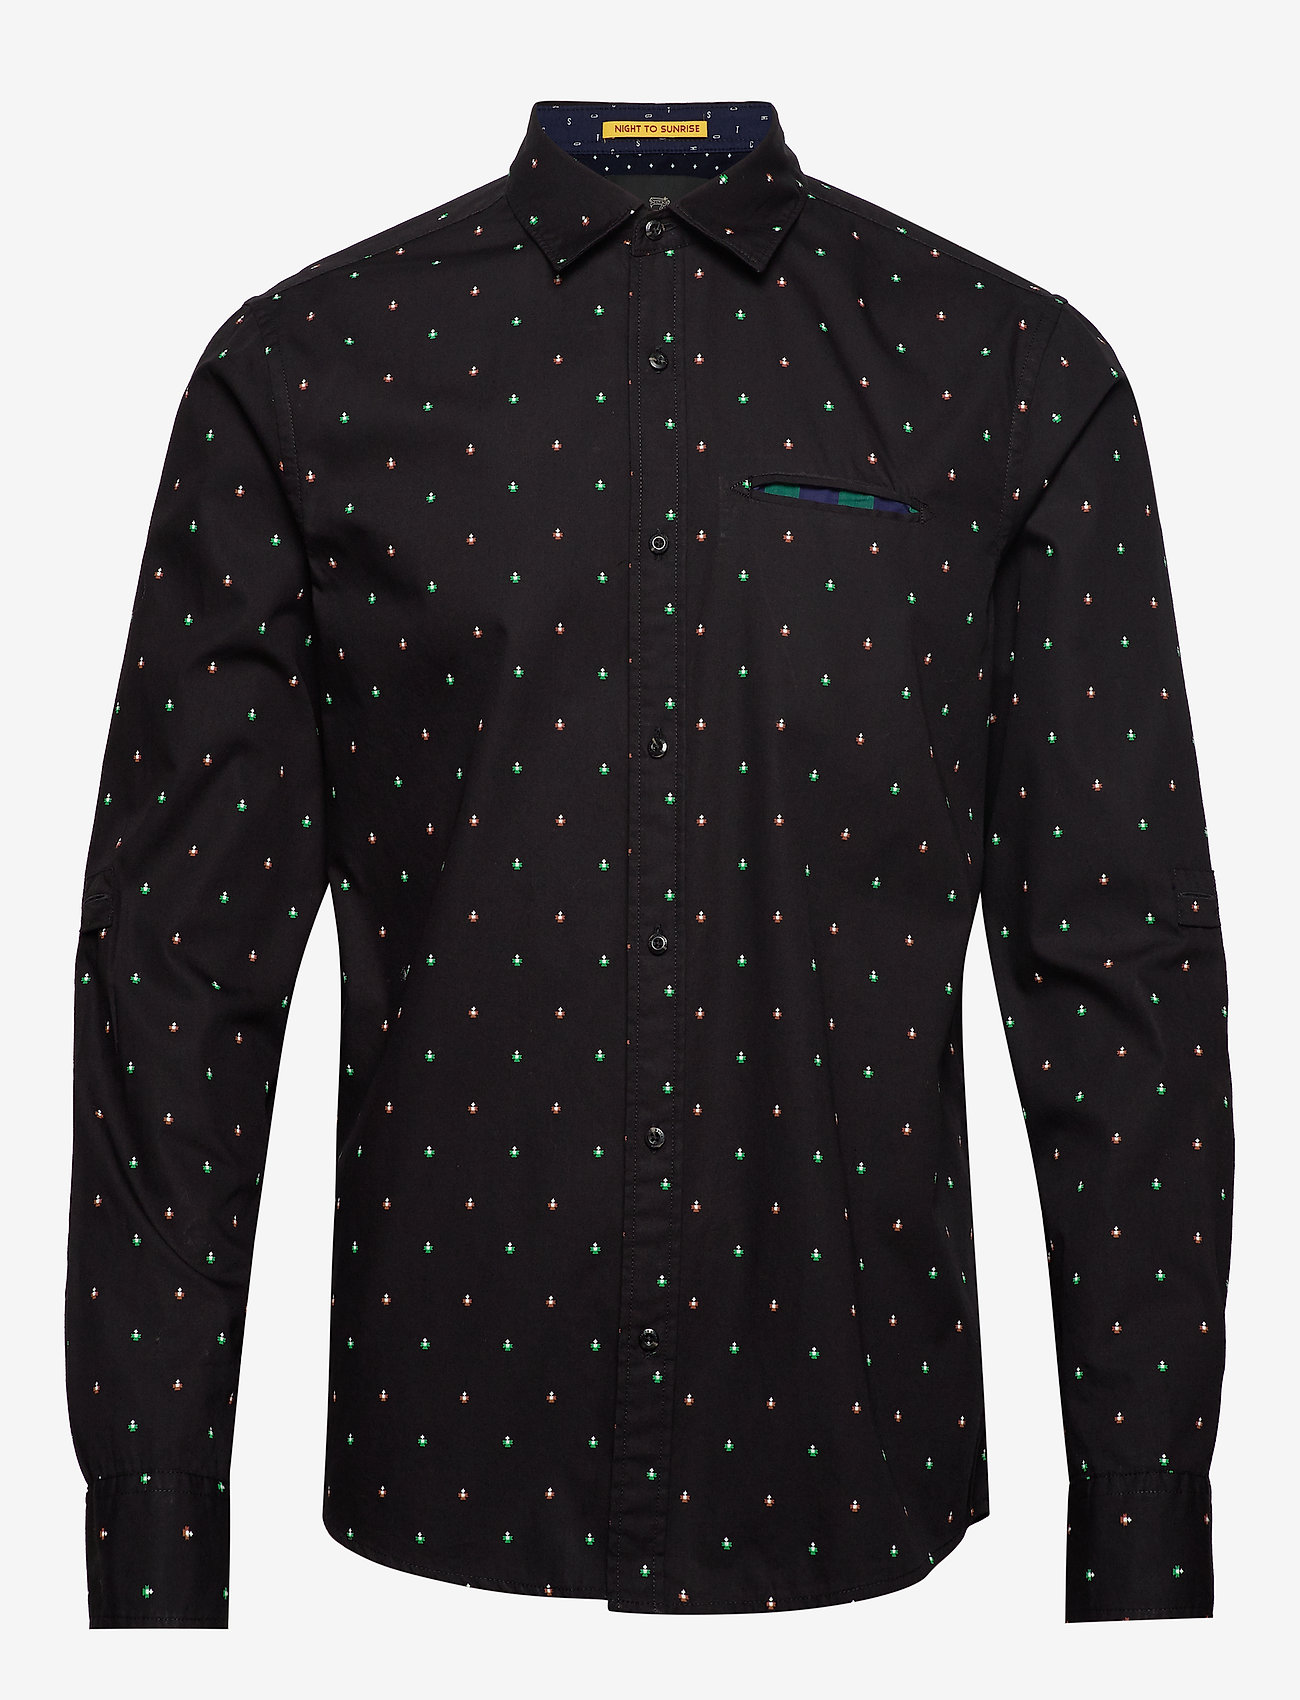 Scotch & Soda - REGULAR FIT- Classic all-over printed pochet shirt - chemises d'affaires - combo e - 0